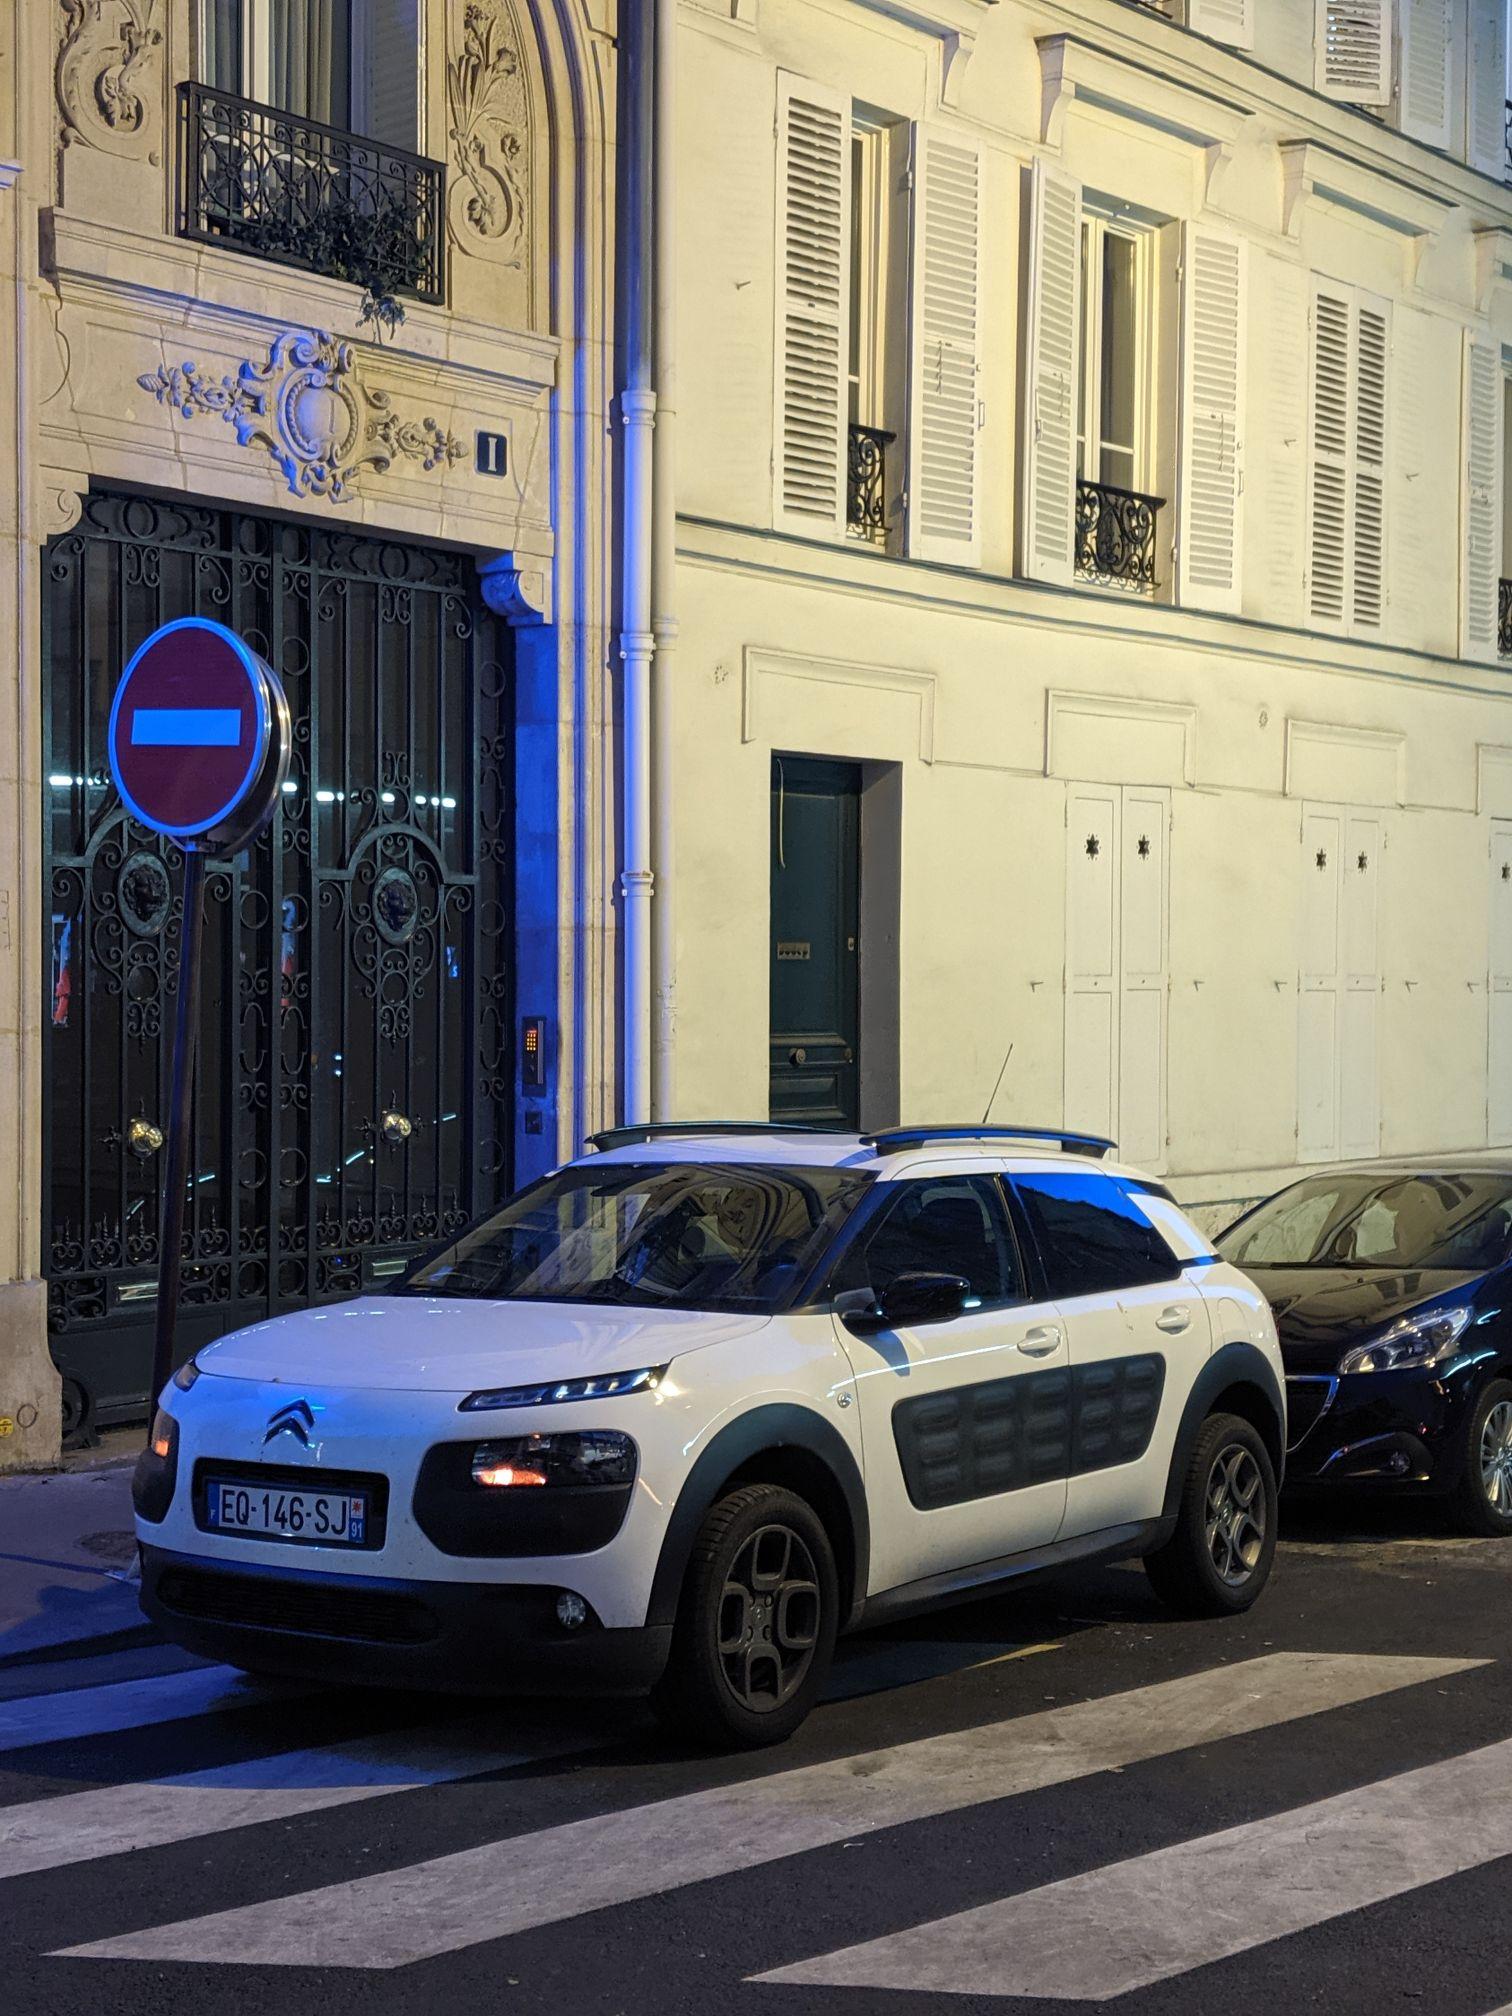 Paris Cars Citroen C4 White